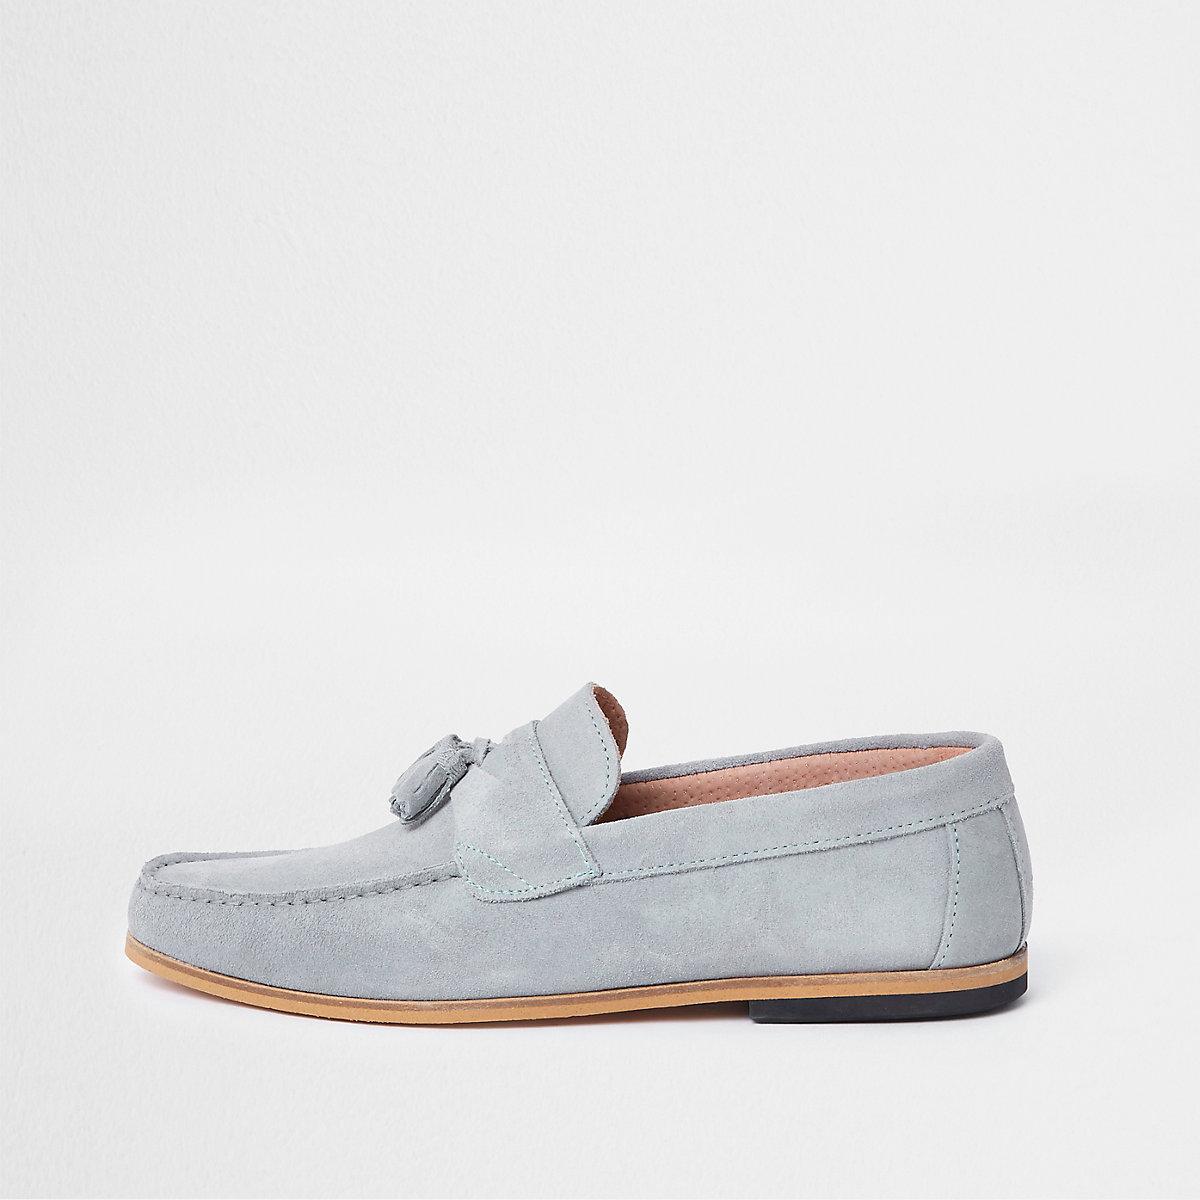 Light blue suede tassel loafers